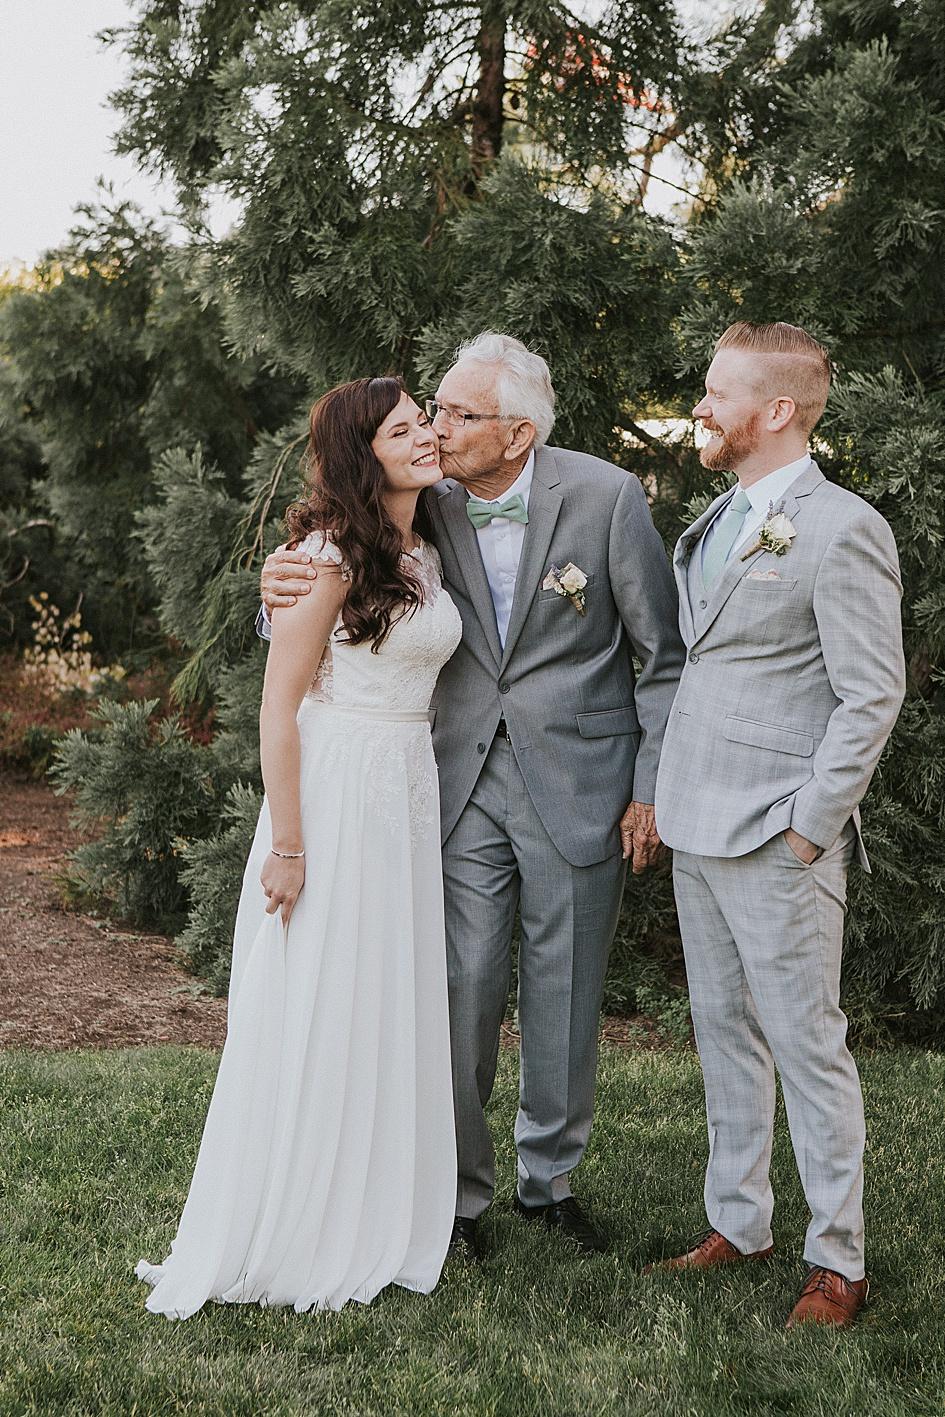 oregon wedding, wedding inspo, wedding photography, oregon wedding photography, outdoor wedding